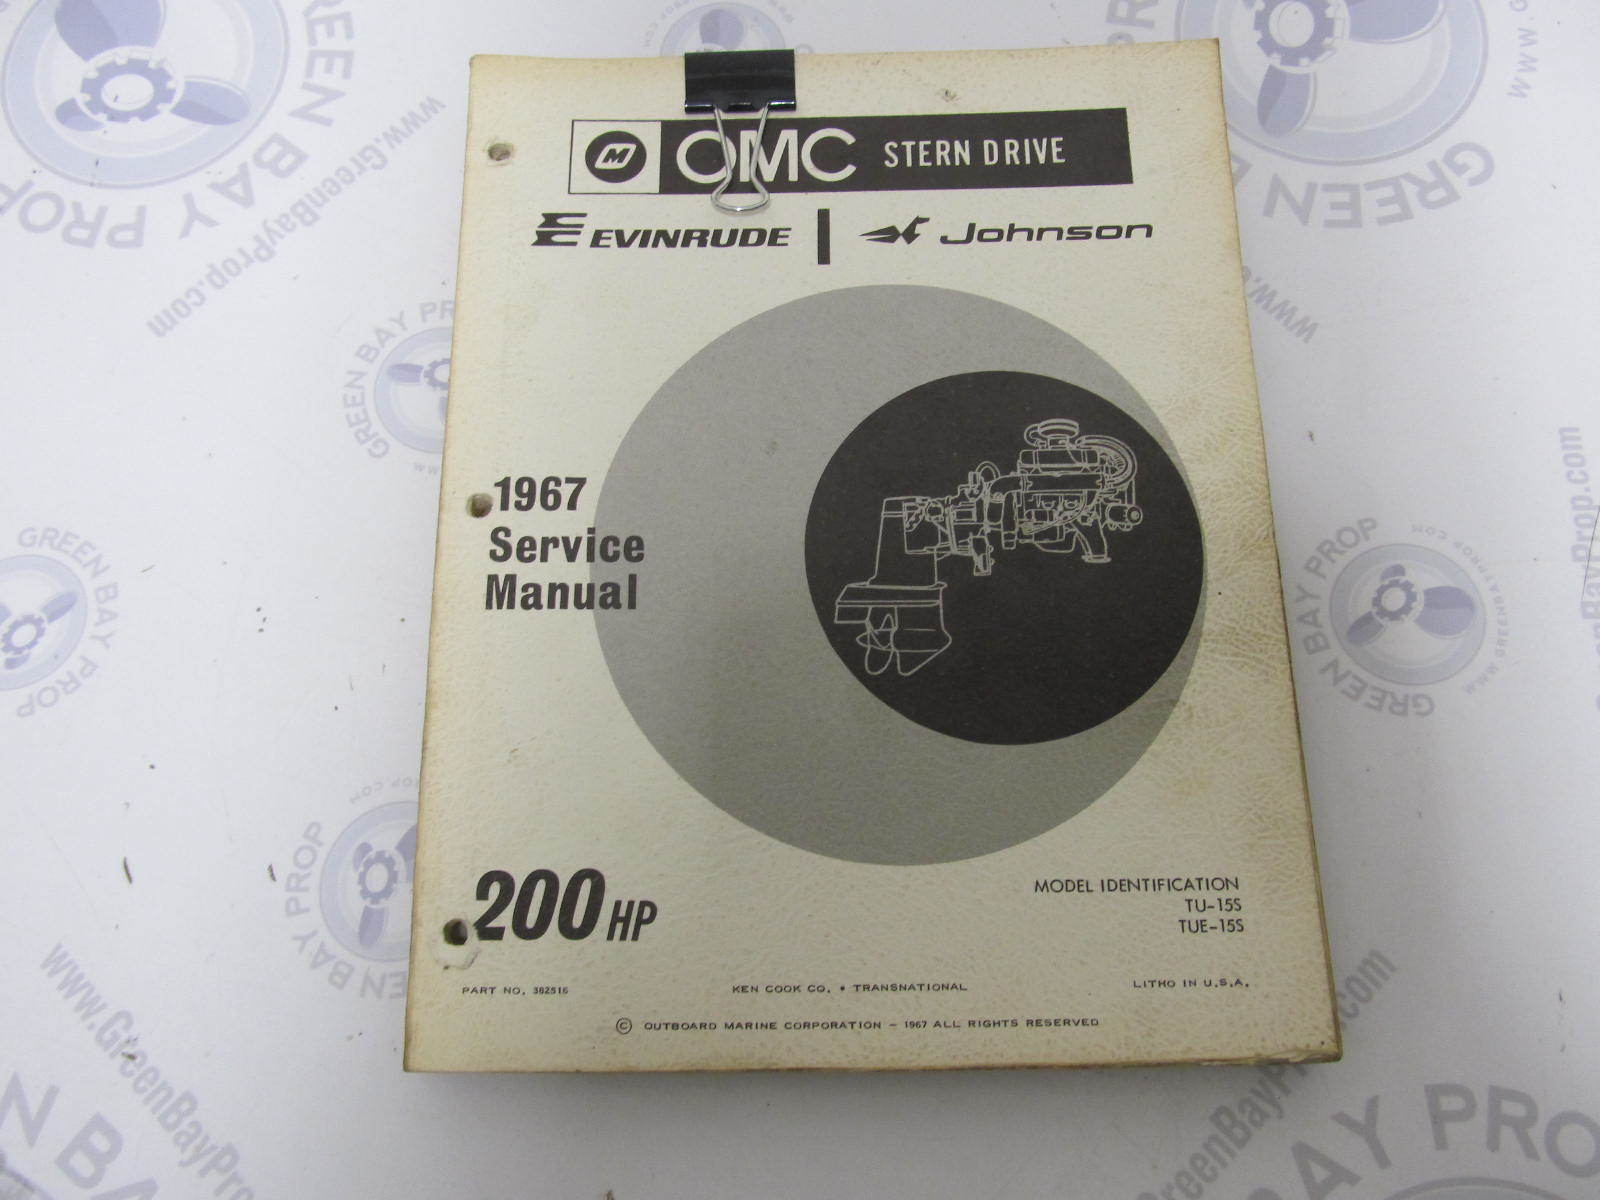 382516 omc evinrude johnson stern drive 200 hp 1967 service manual rh greenbayprop com OMC Sterndrive Diagnosis OMC Sterndrive Lubrication